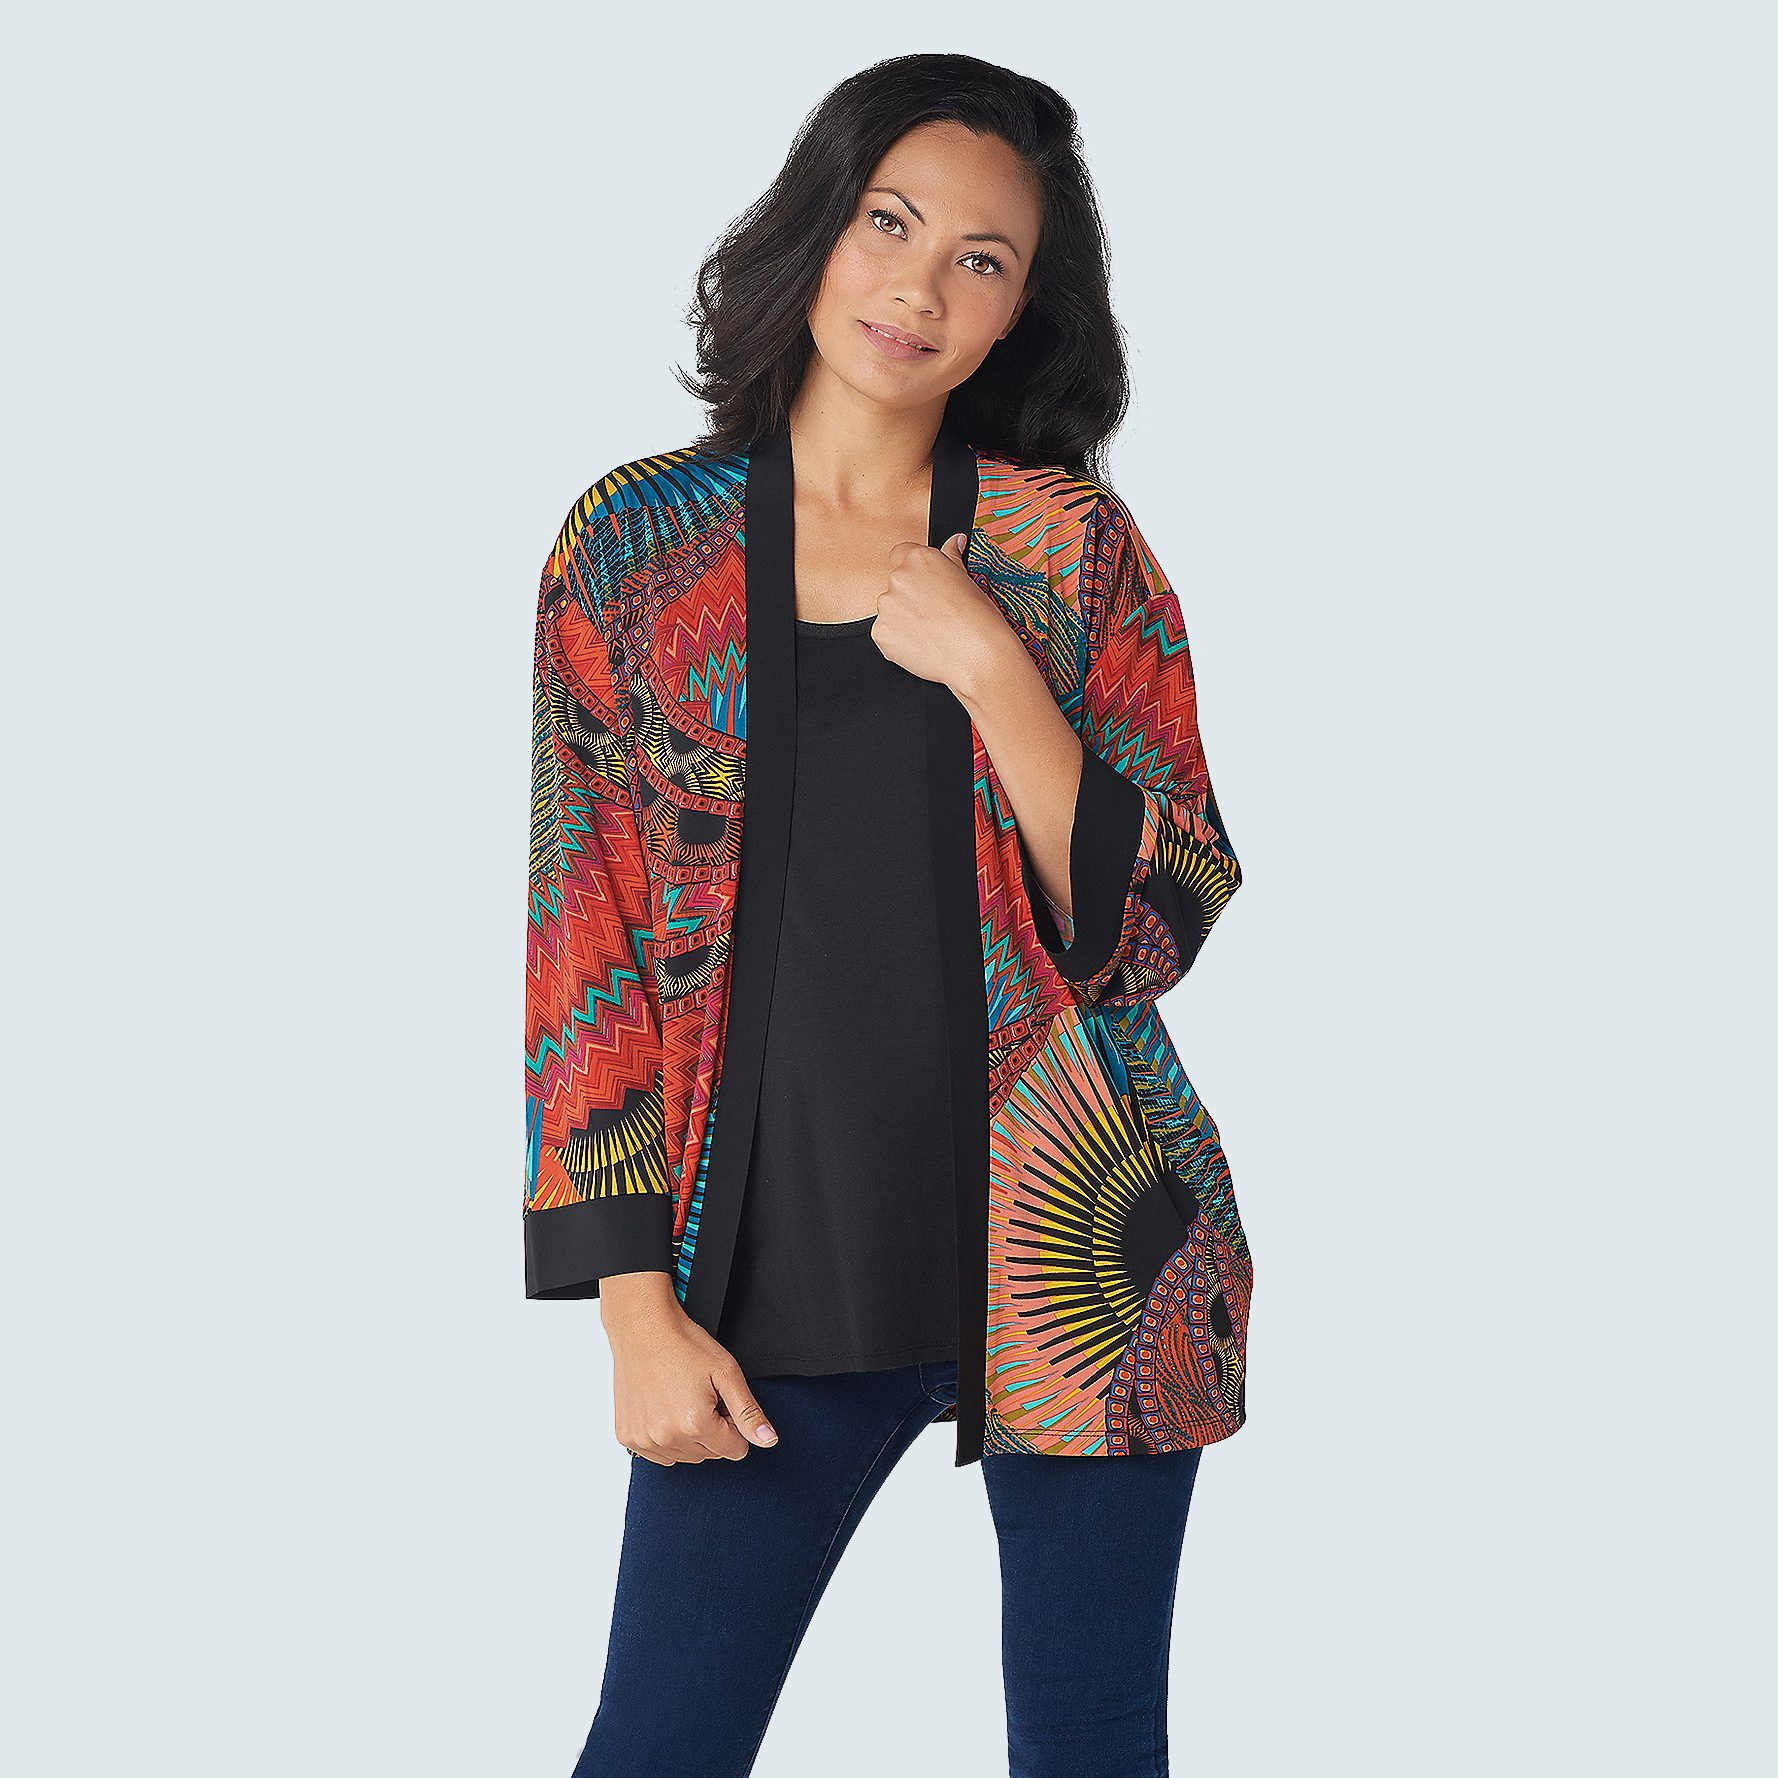 Renee Greenstein Kimono